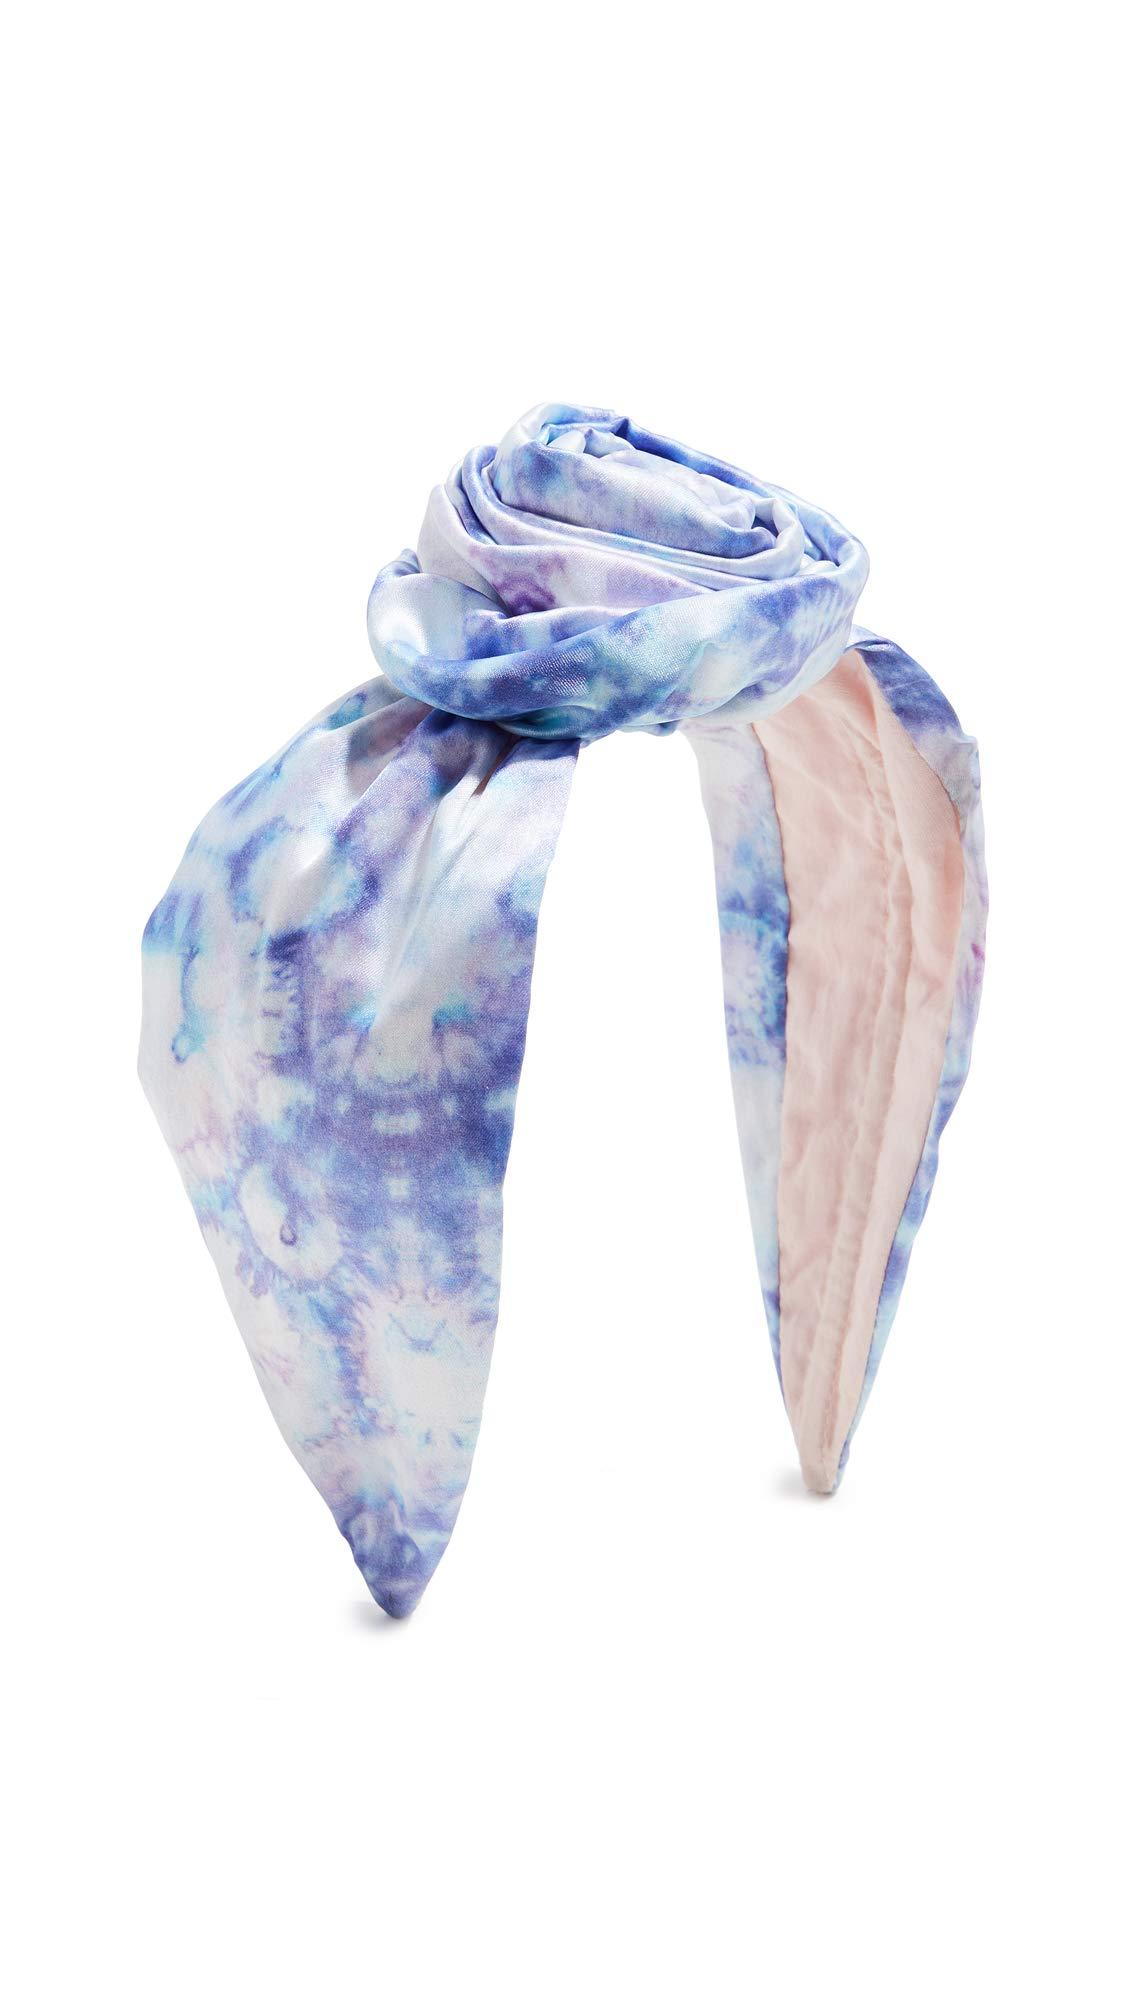 NAMJOSH Women's Tie Dye Bun Headband, Lilac/Blue Tie Dye, One Size by NAMJOSH